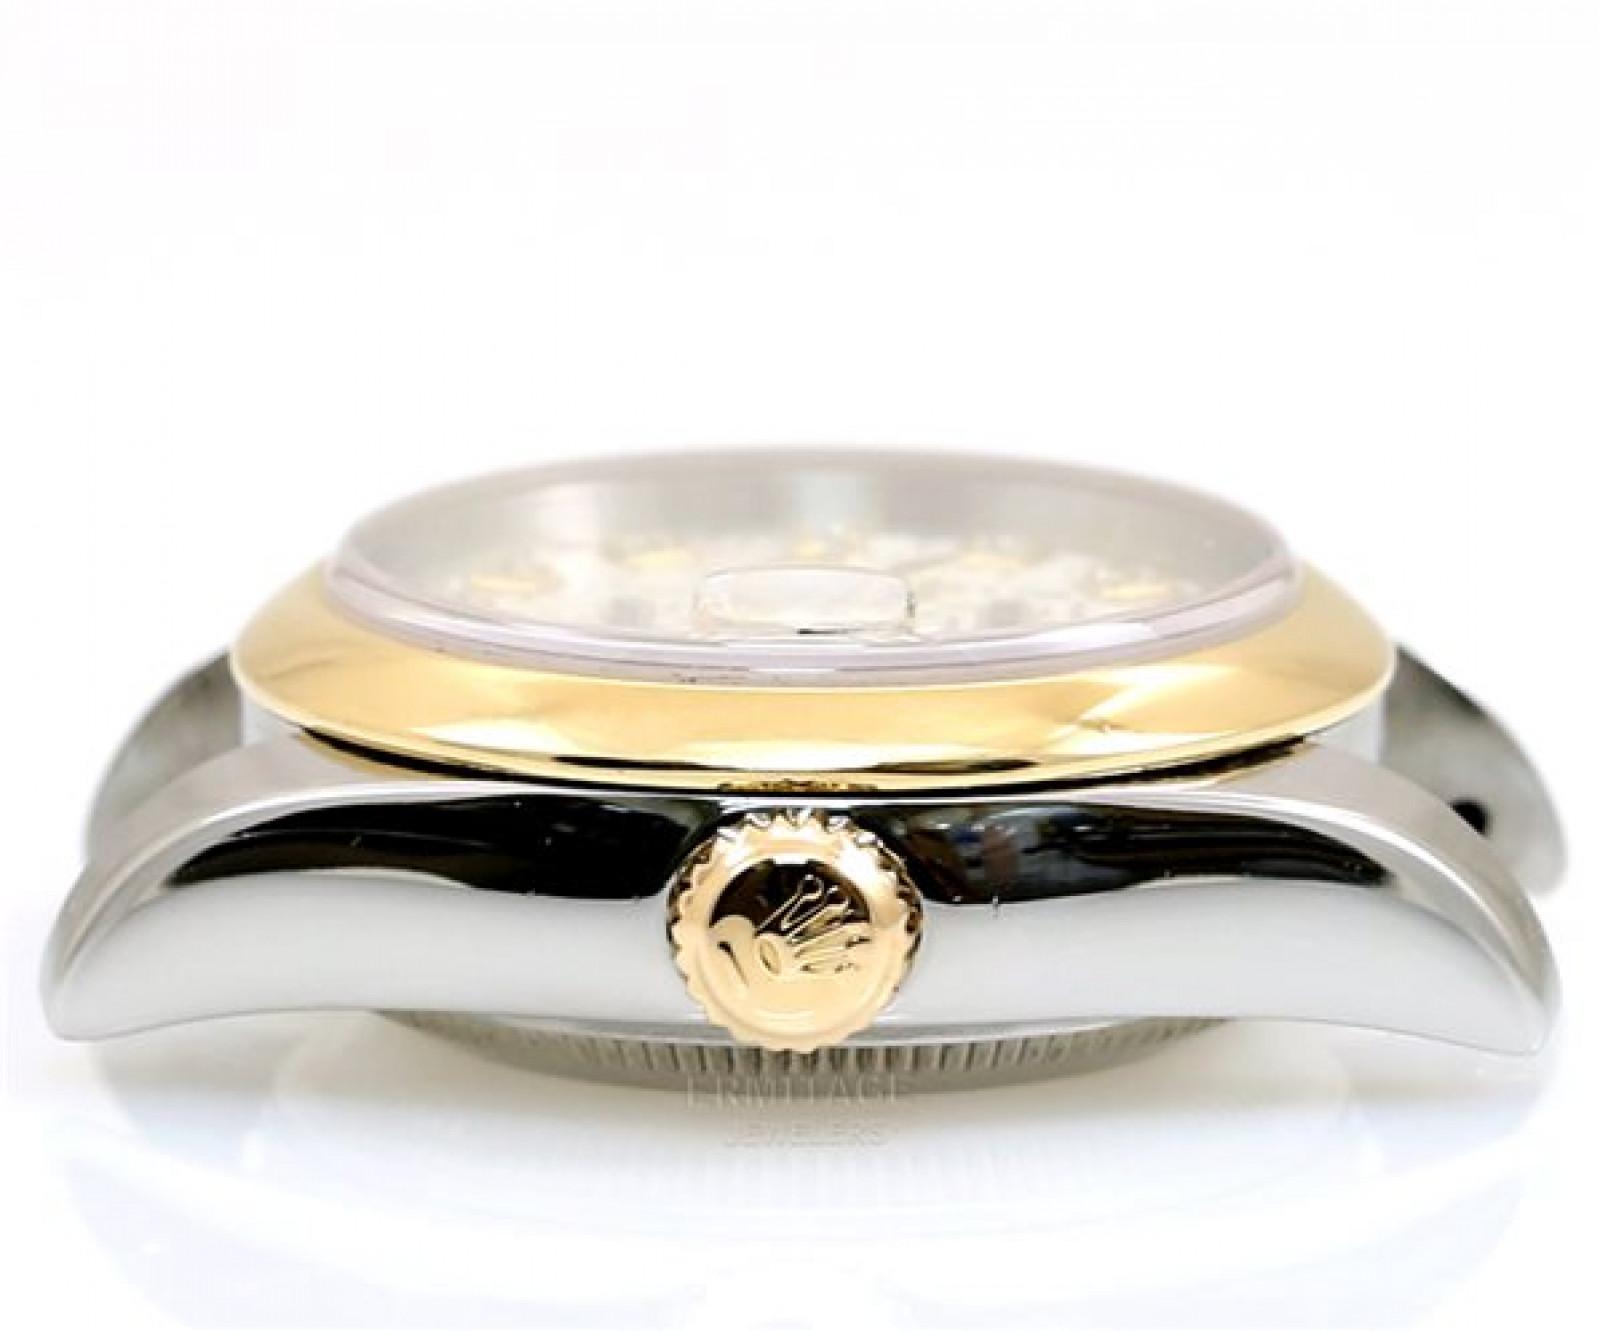 Silver Diamond Dial Rolex Datejust 179163